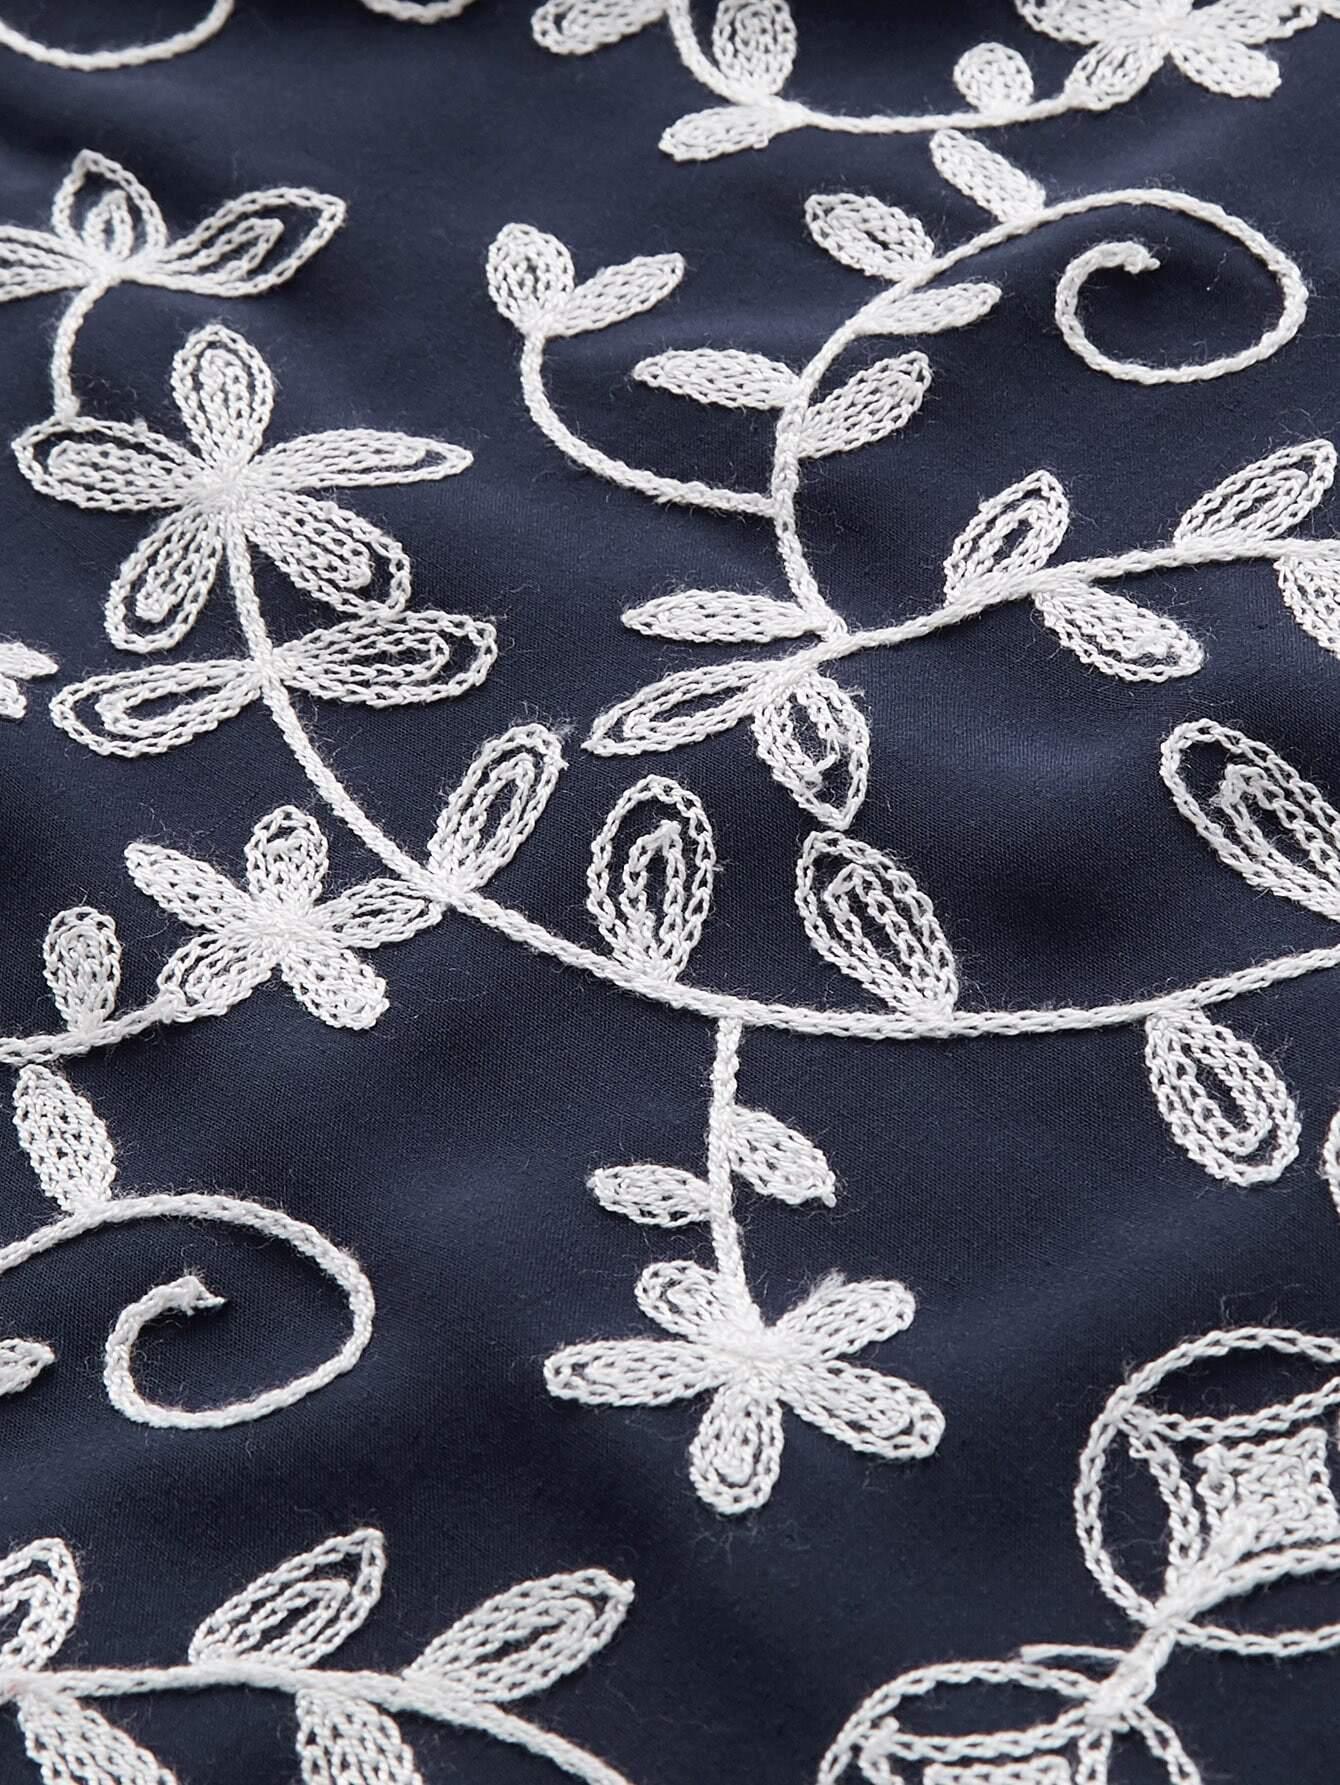 grande taille robe imprim e des fleurs avec ceinture et la pile inclin e french shein sheinside. Black Bedroom Furniture Sets. Home Design Ideas